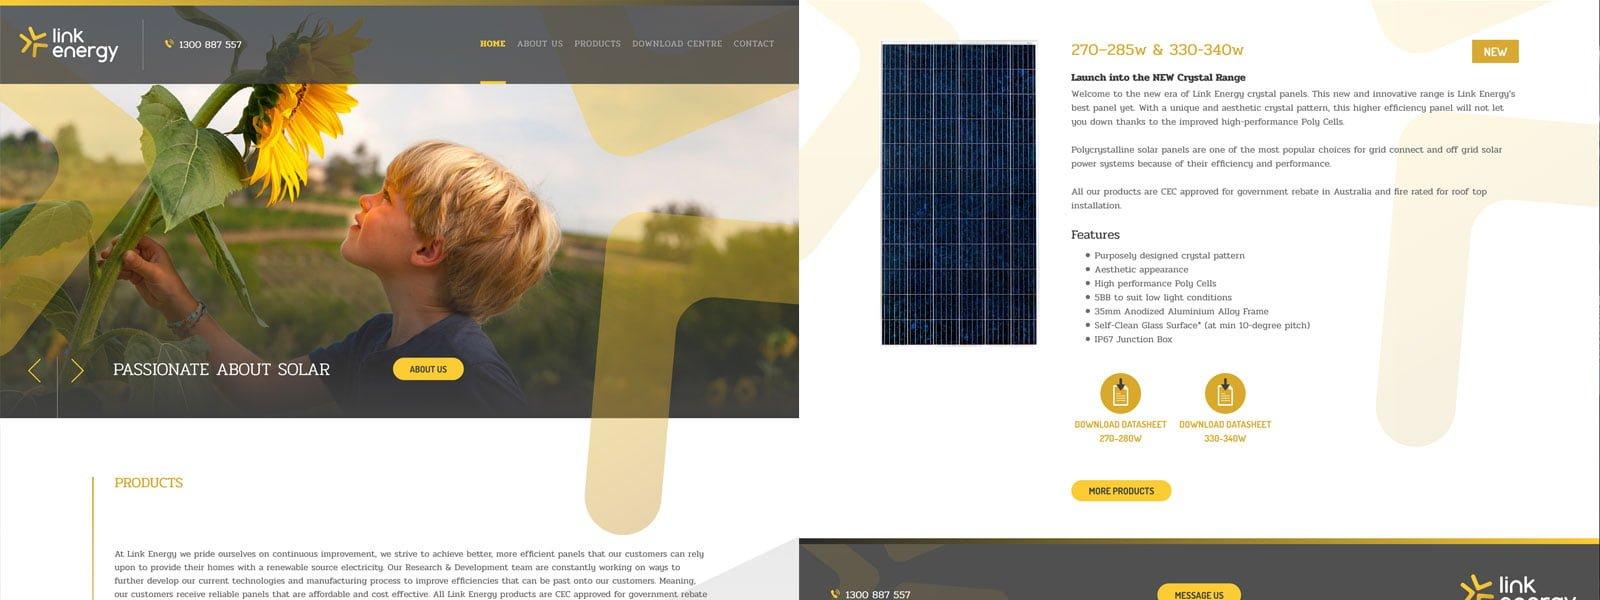 Website by Zephyrmedia Gold Coast